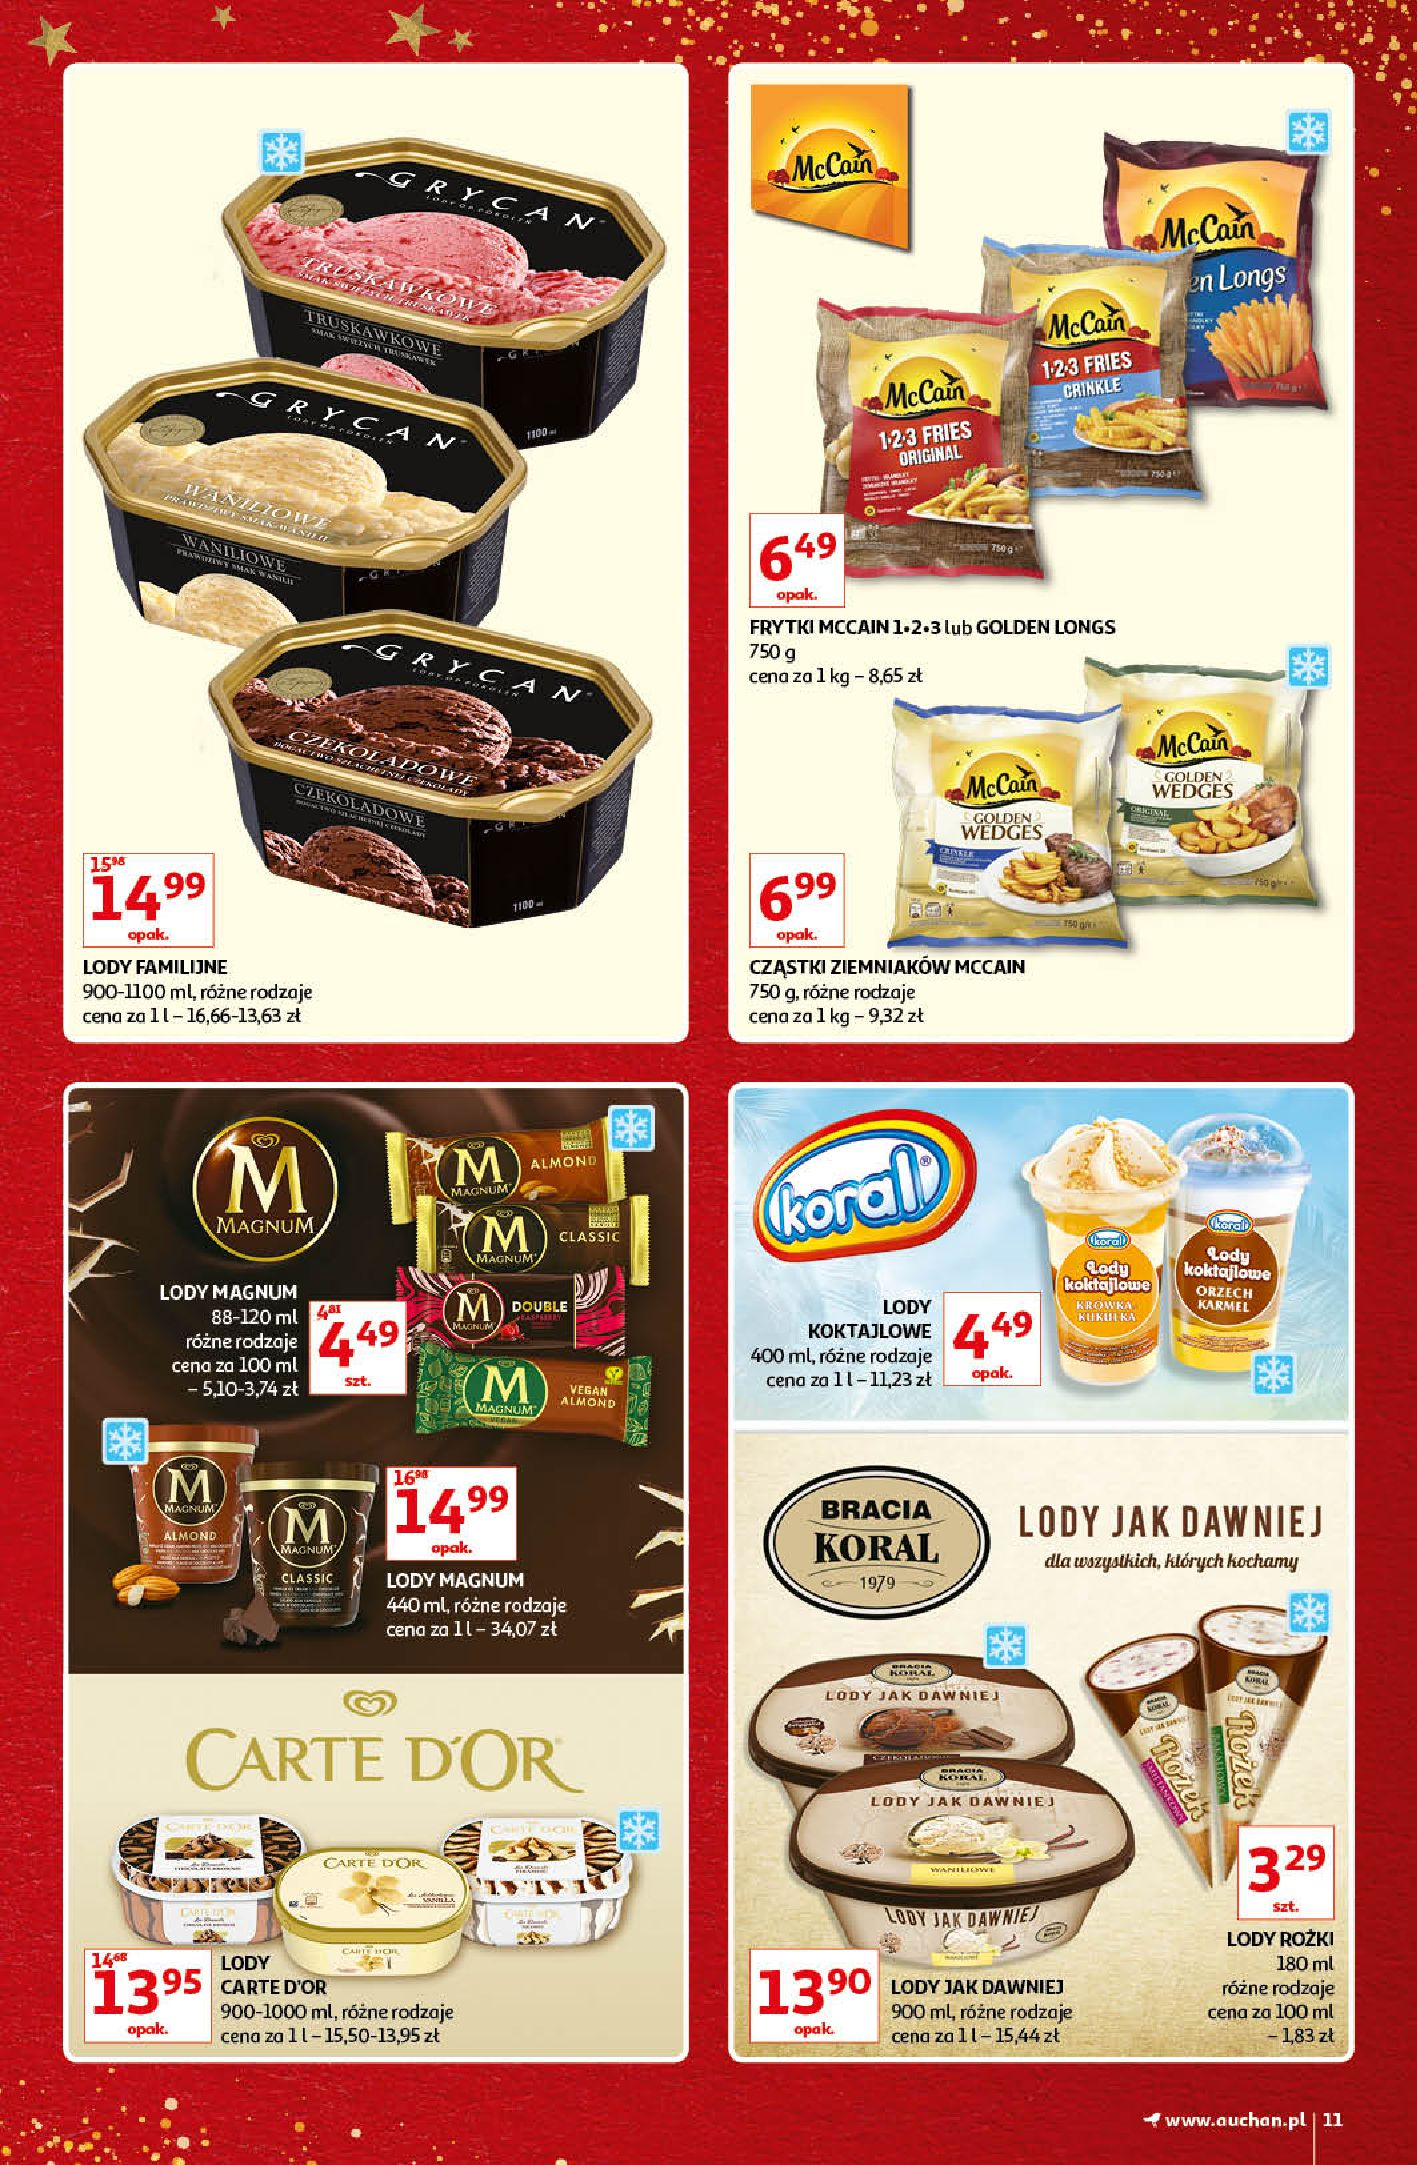 Gazetka Auchan - Kultowe Marki Hipermarkety-04.12.2019-15.12.2019-page-11